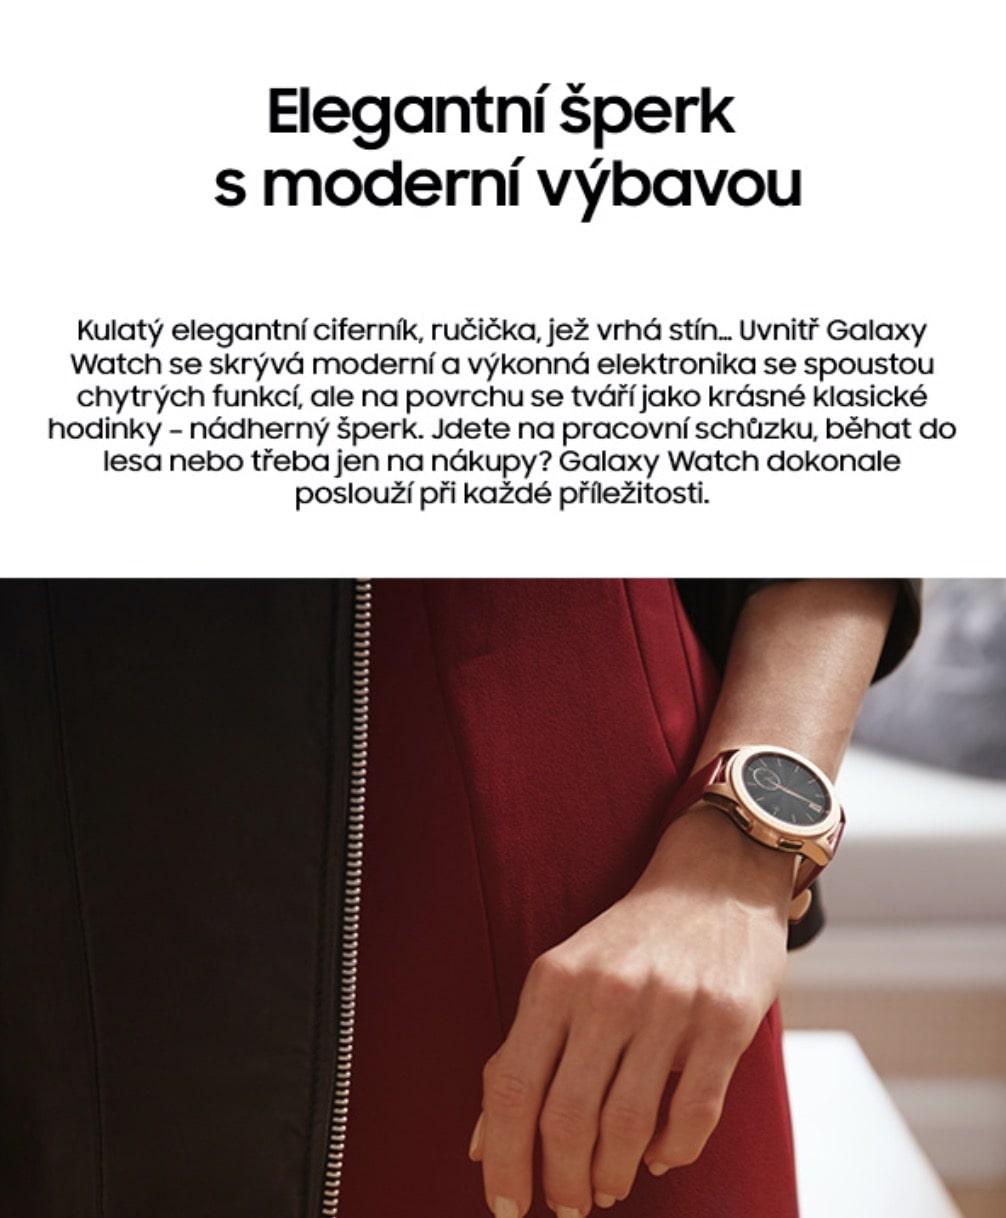 Chytré hodinky Samsung Galaxy Watch 42mm – obě barvy 2-min